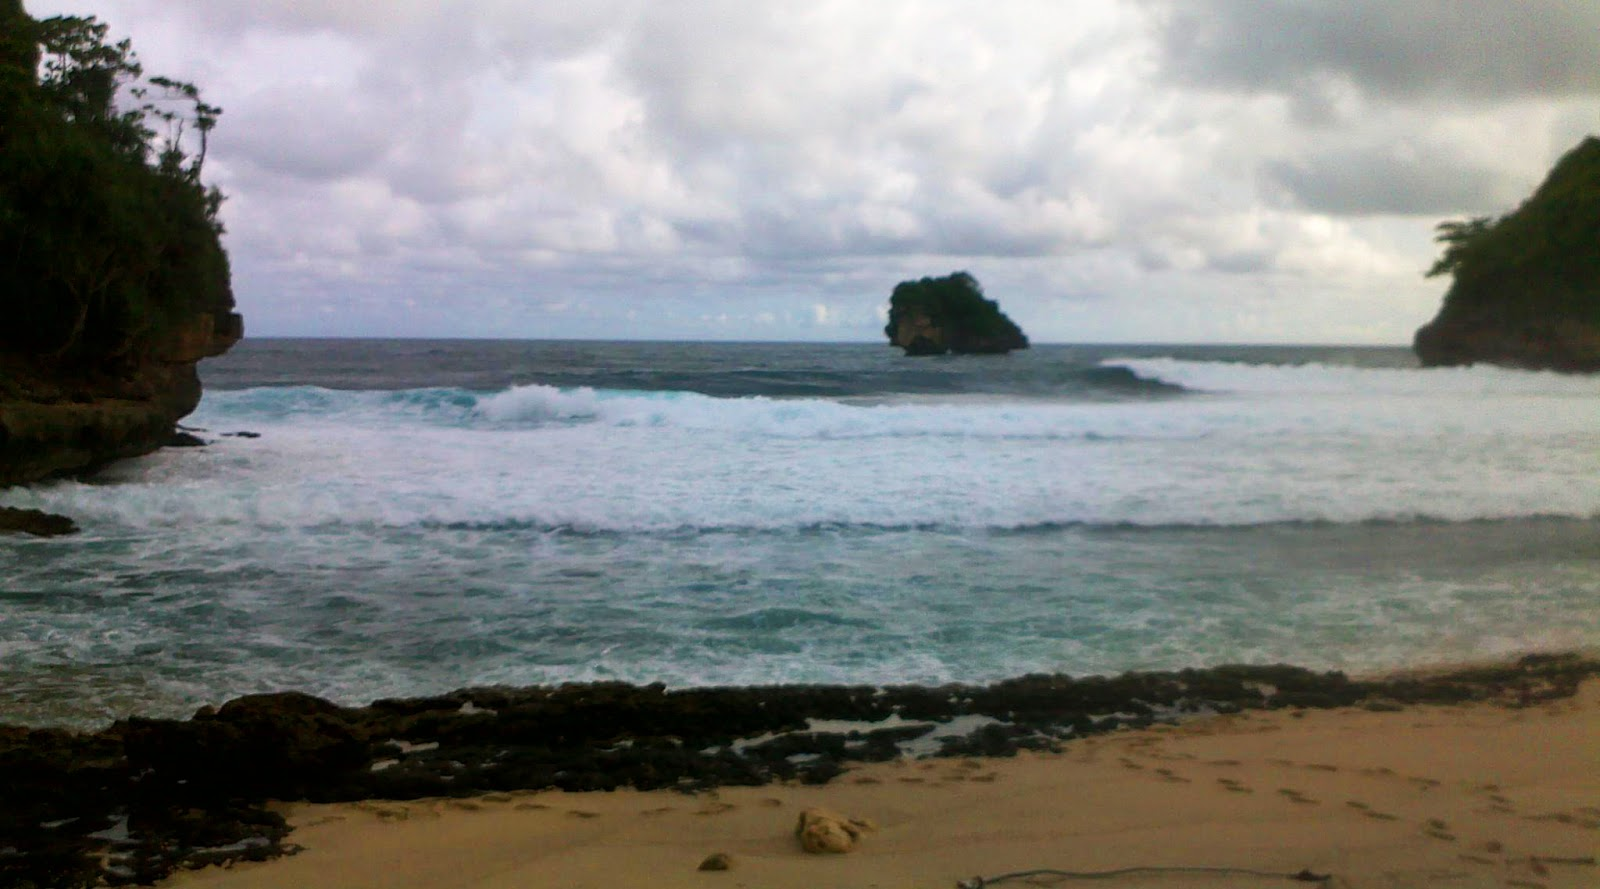 ombak di pantai Gua China sangat besra dan keras